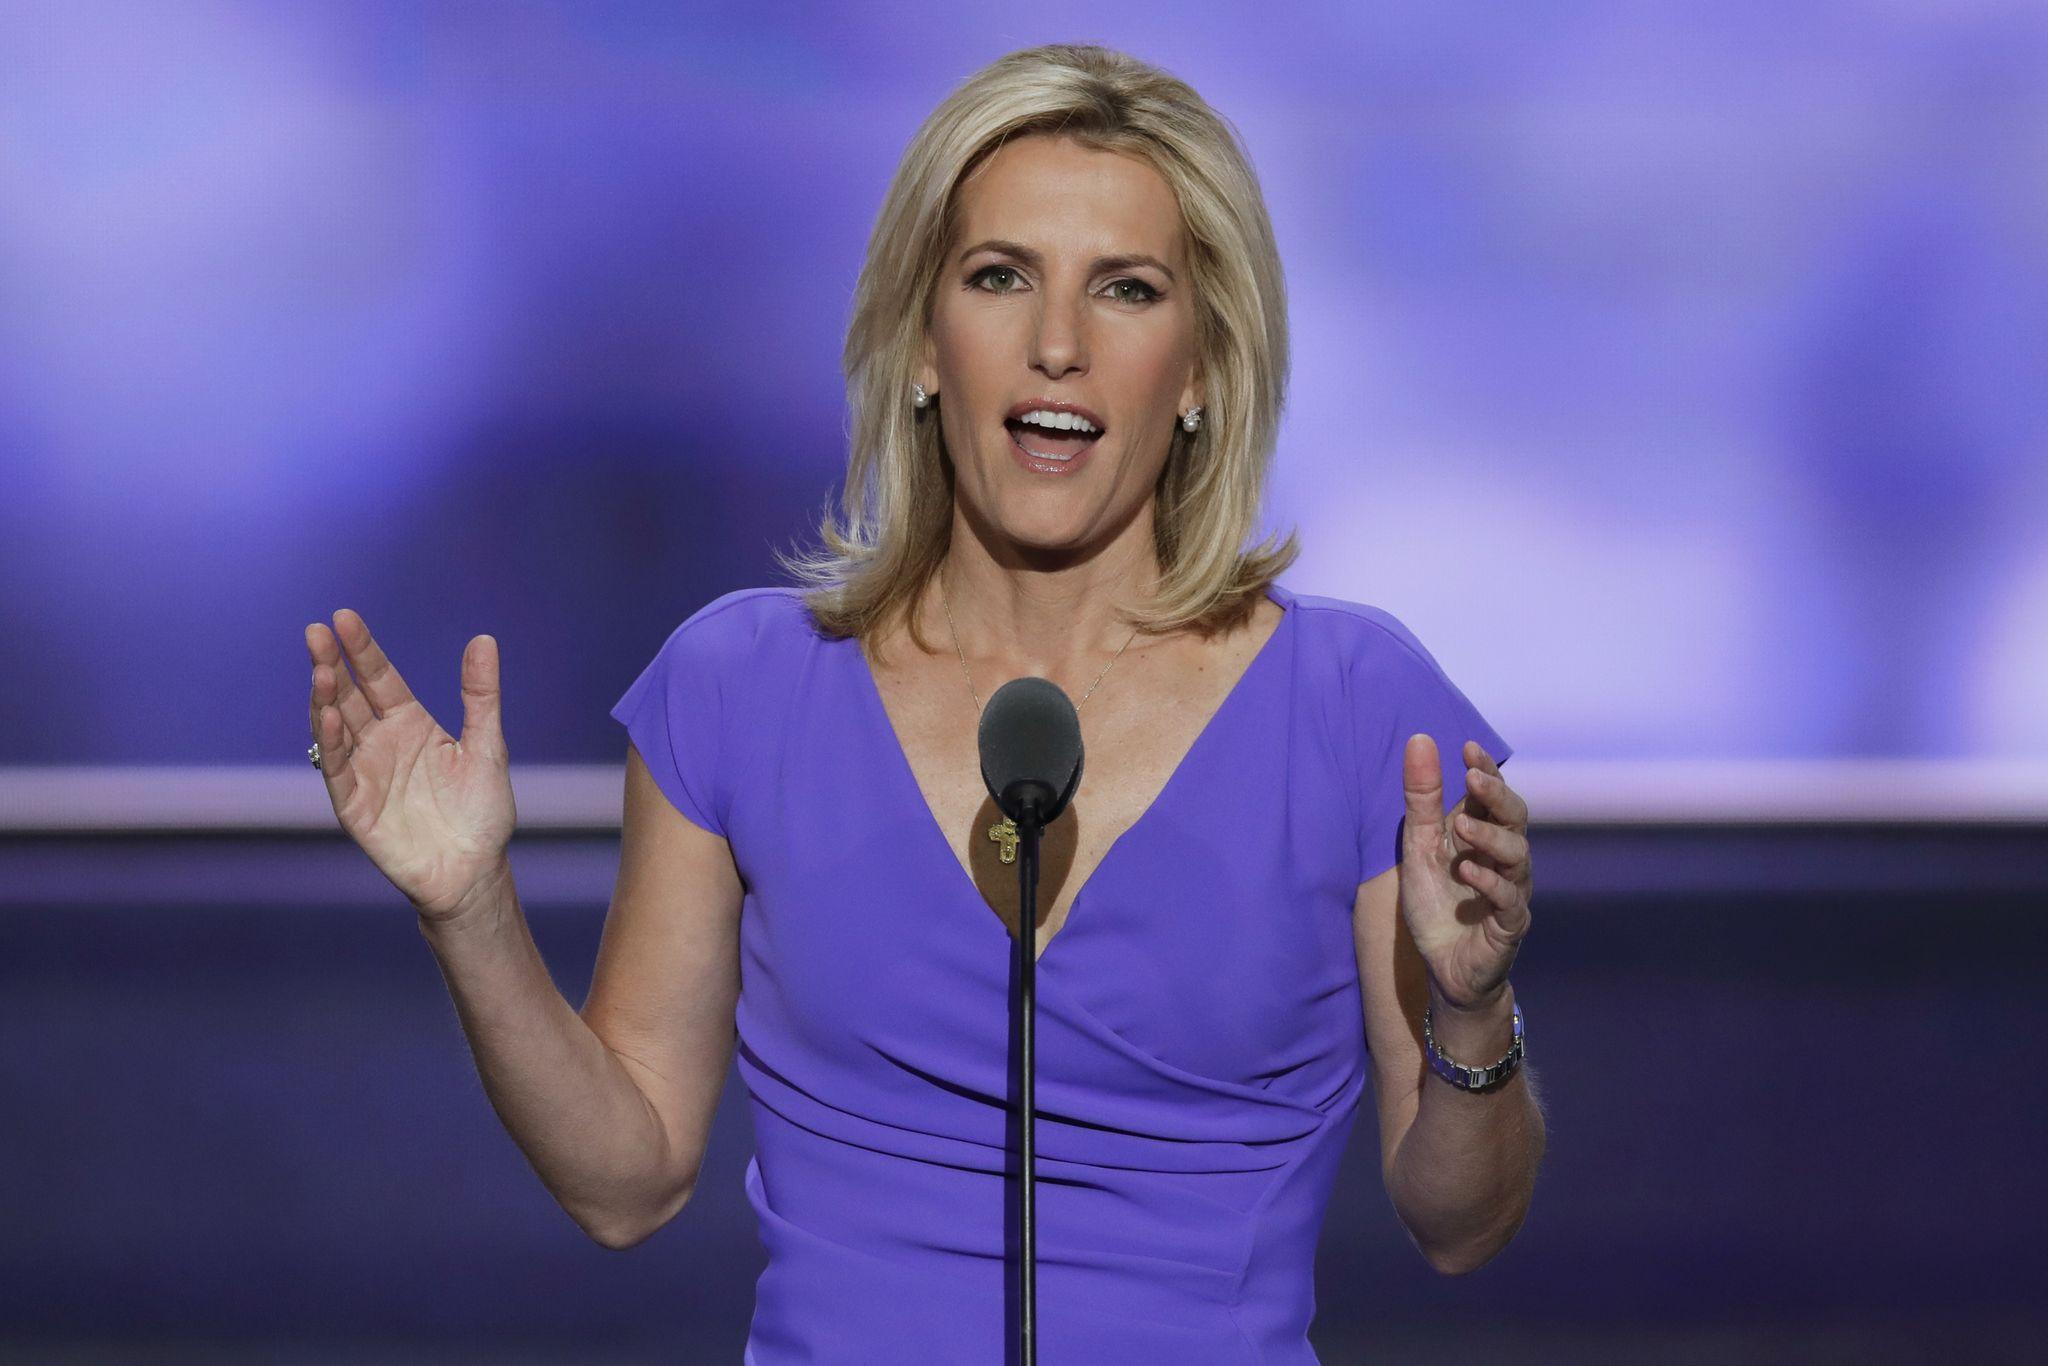 Laura Ingraham run through shredder of lying national media